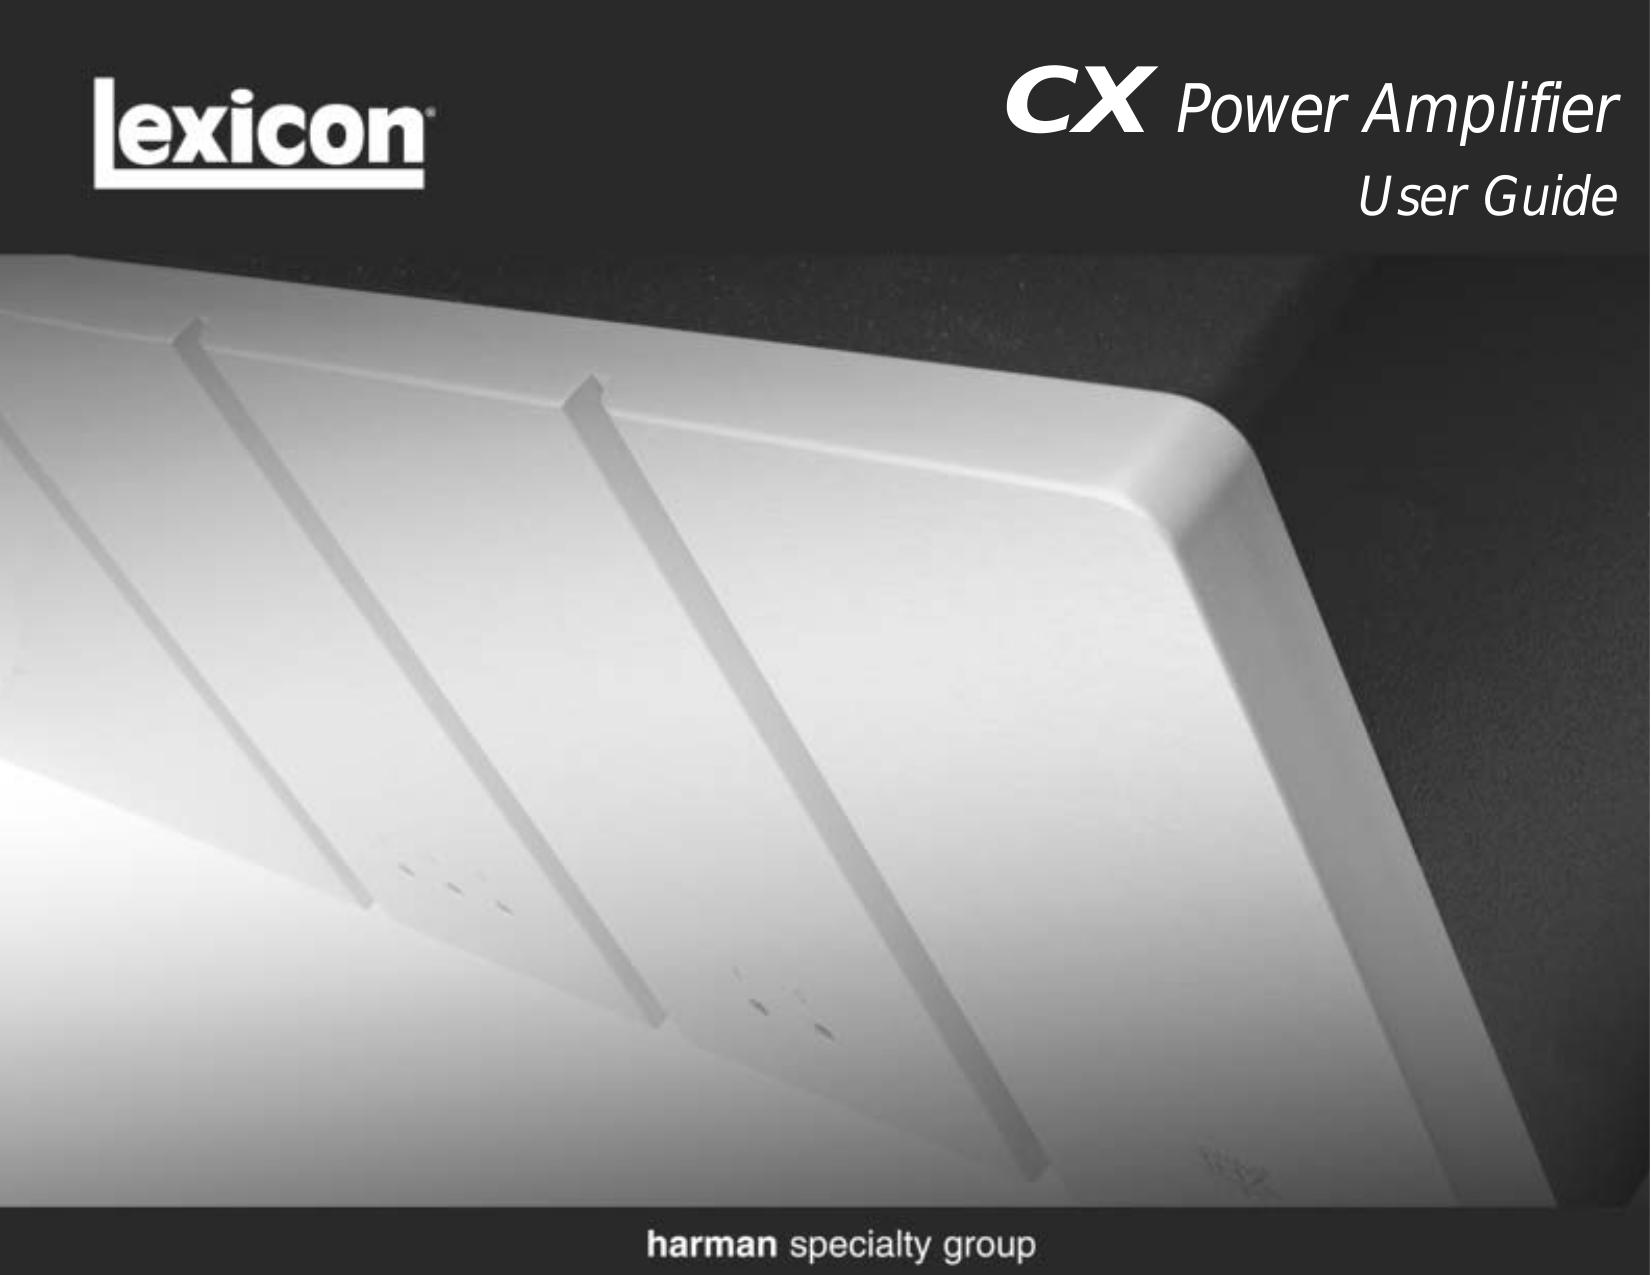 pdf for Lexicon Amp LX-7 manual